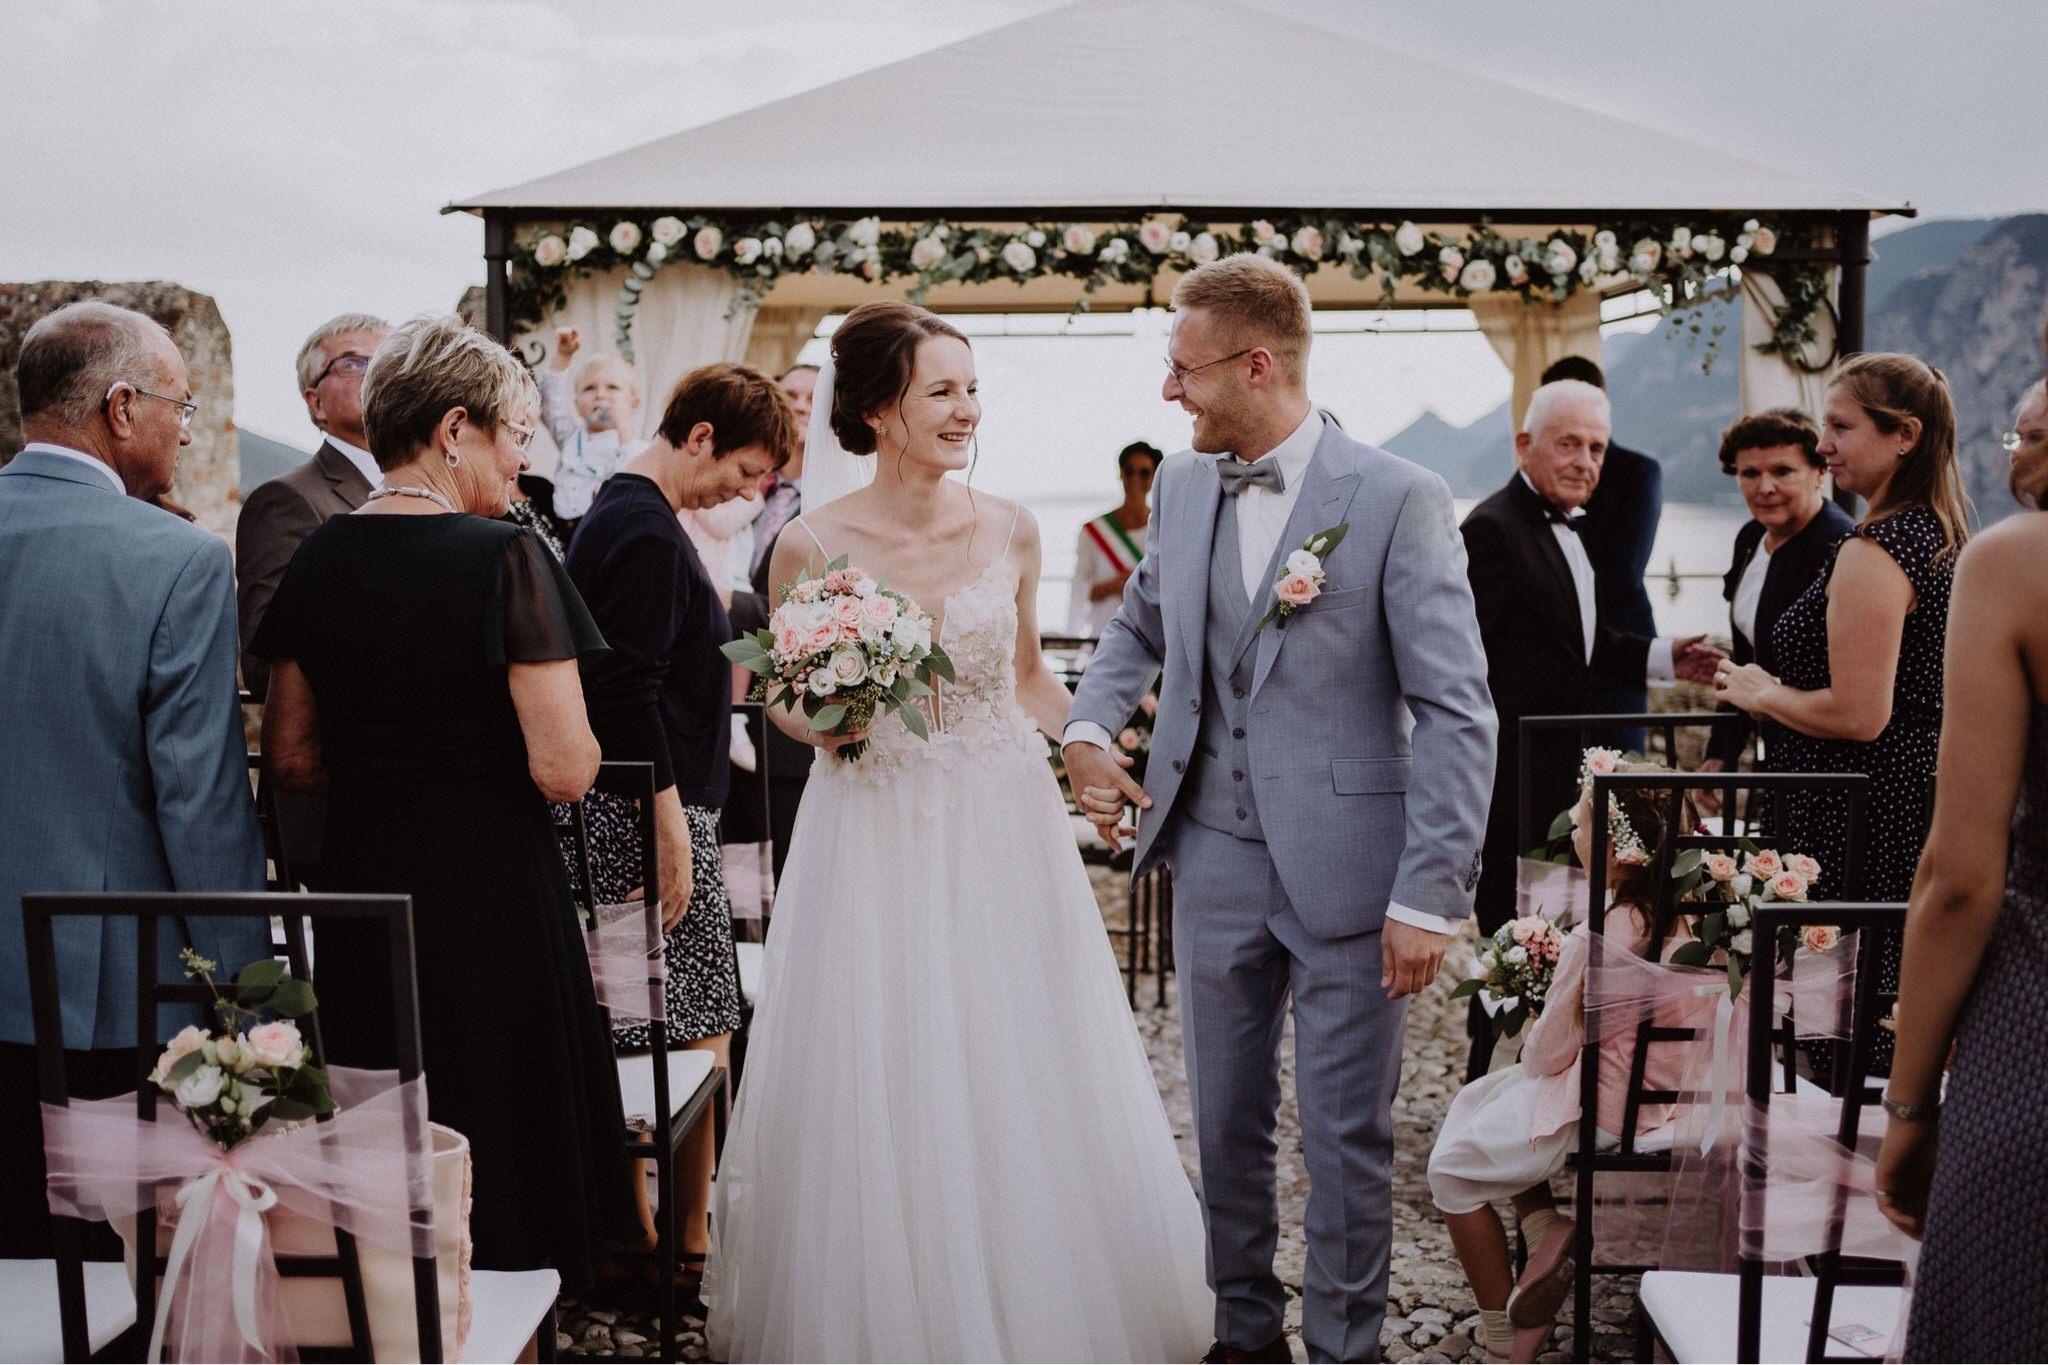 41_la-03-zeremonie-1134_weddinphotographer_Hochzeitsfotograf_newzealand_hamilton_Weddingphotography_Stuttgart